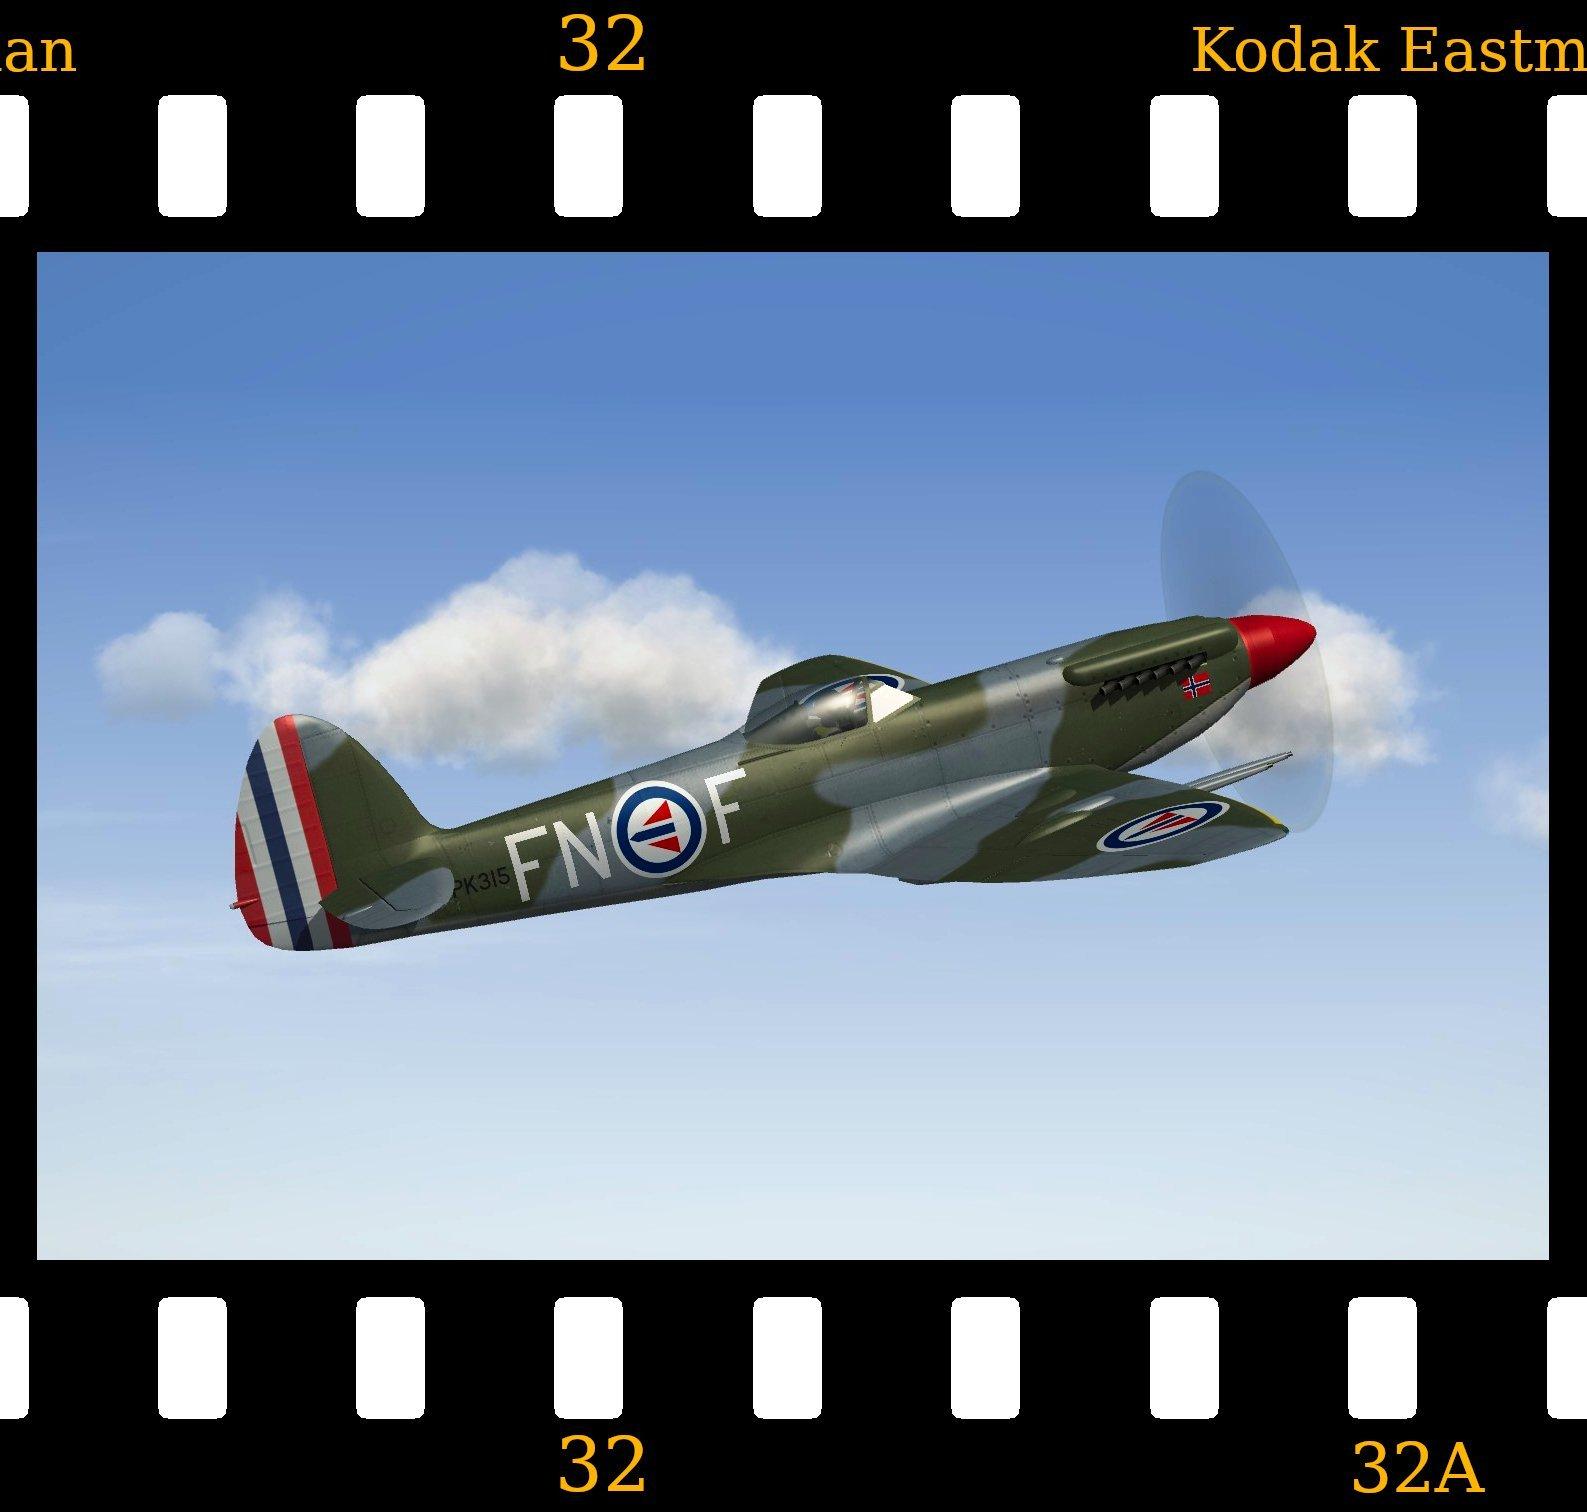 [Fictional] Supermarine Spitfire F.Mk22 'Norway'